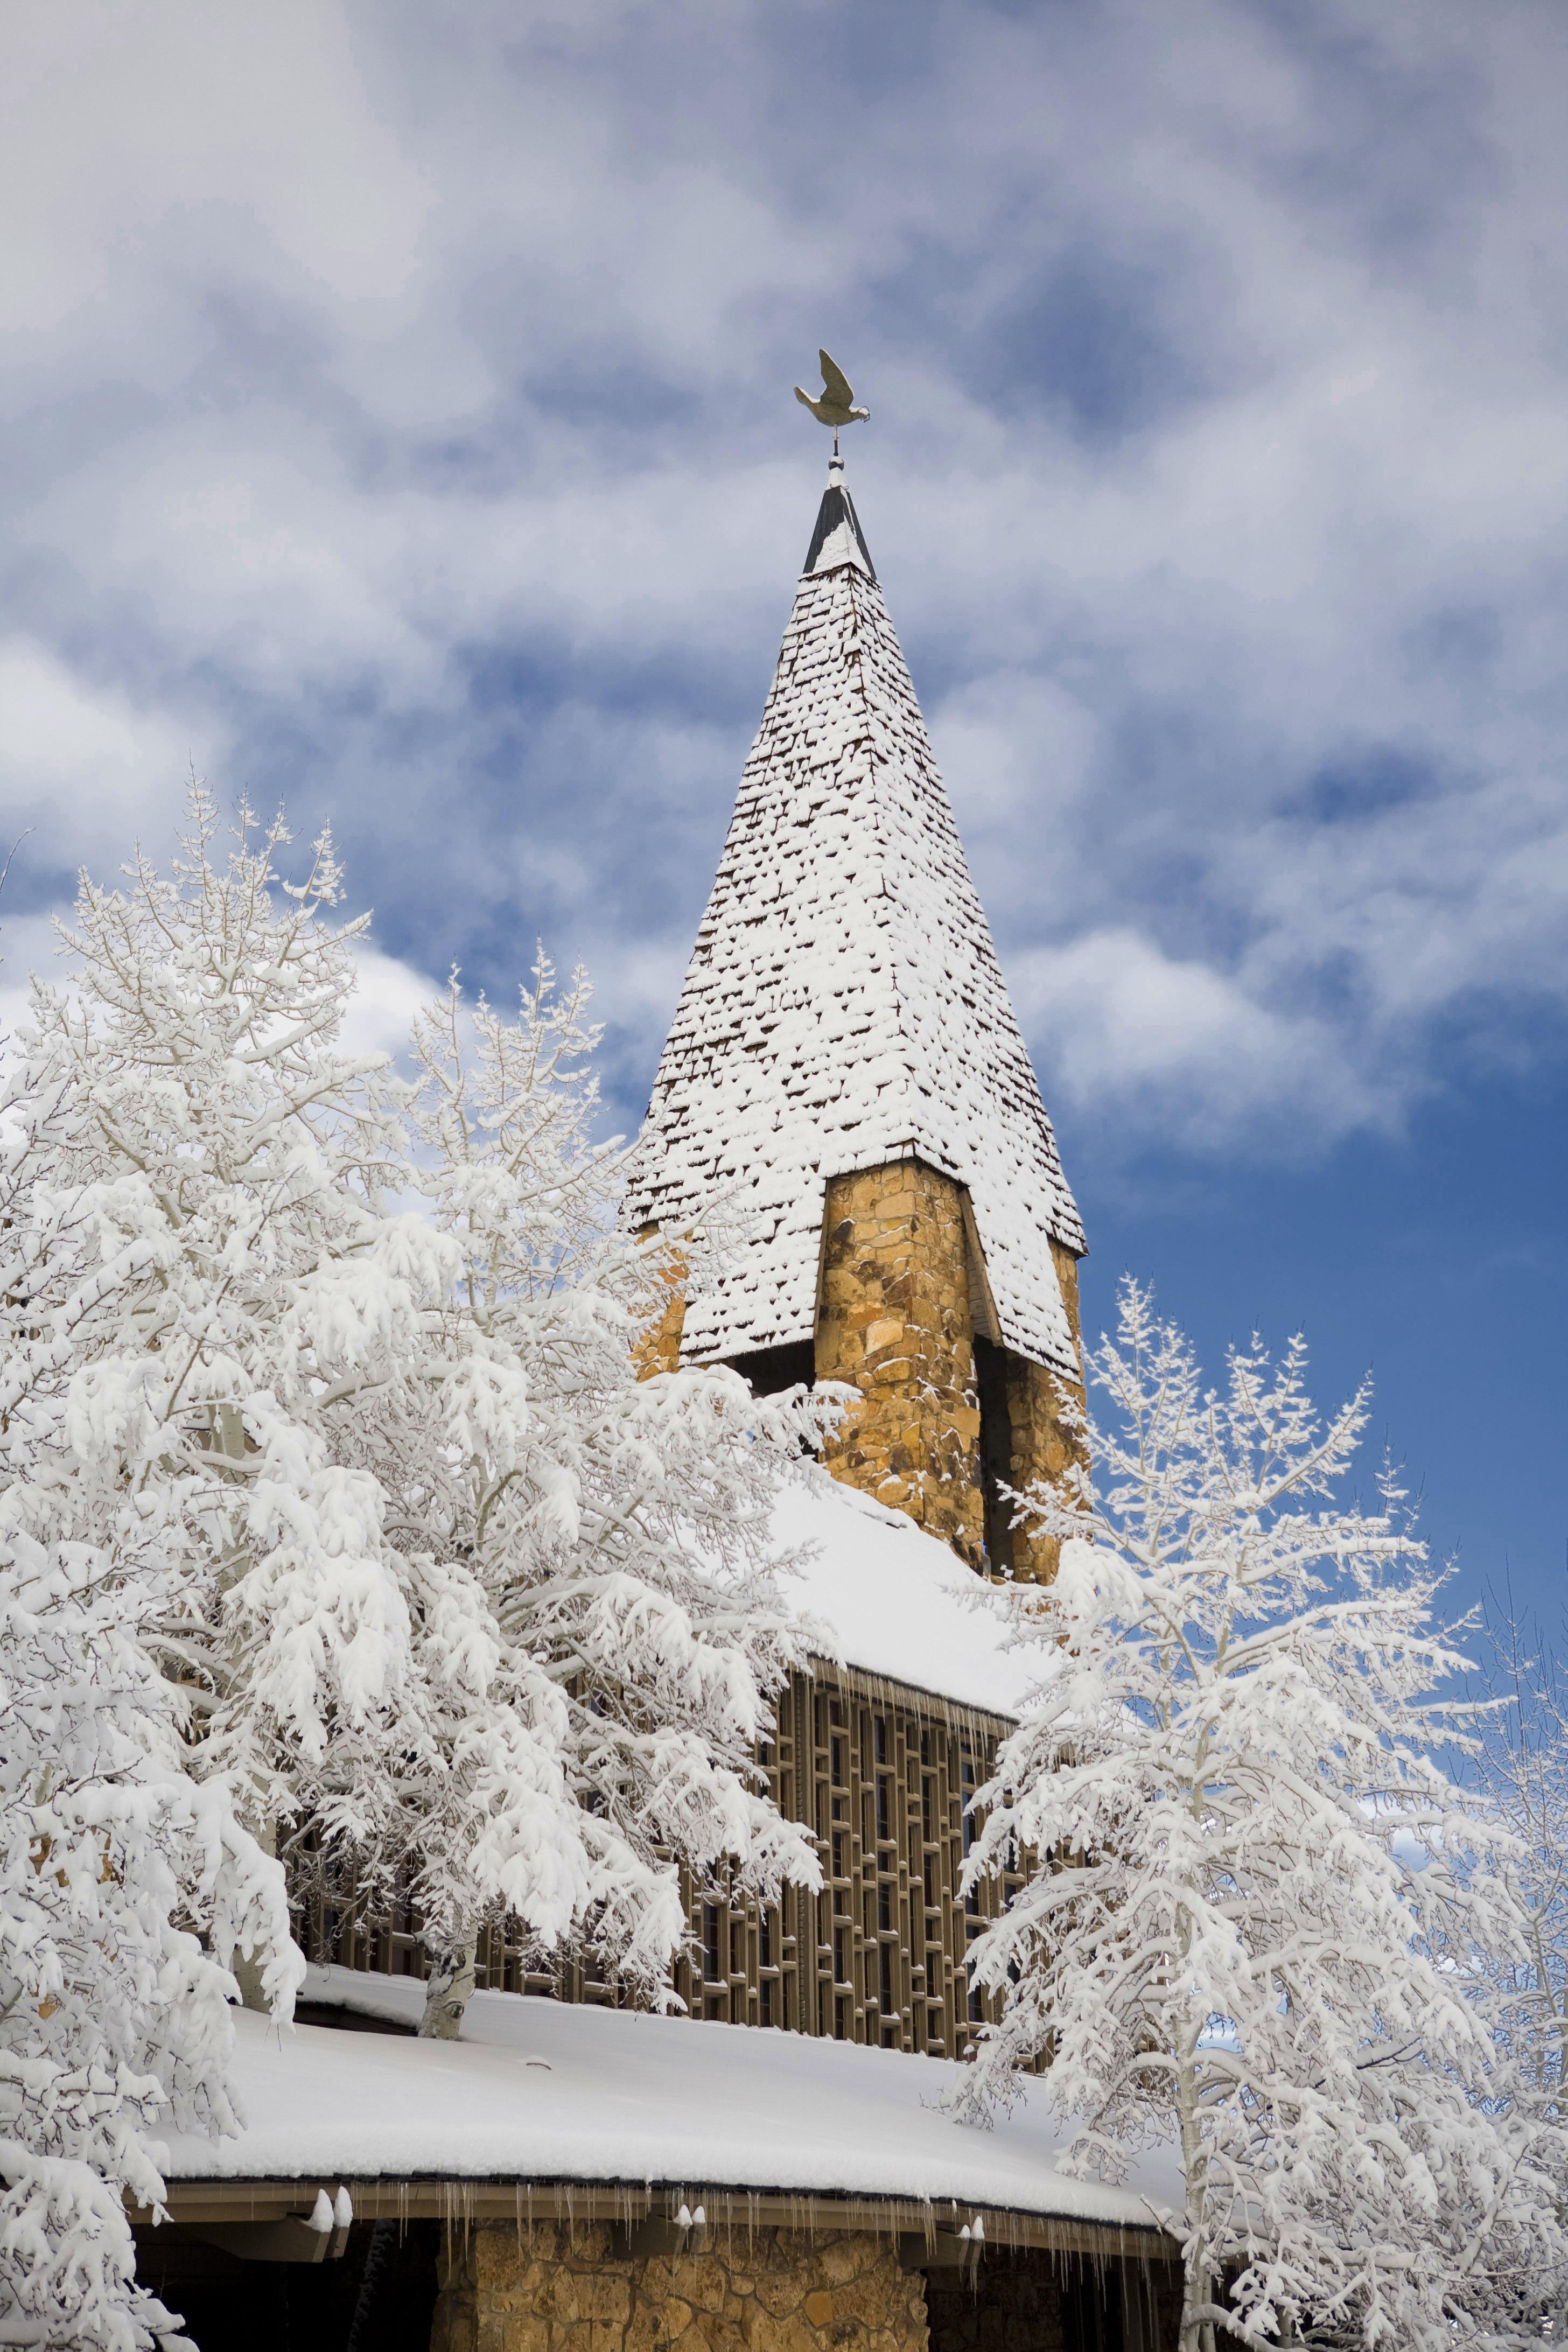 winter wedding planning mistakes to avoid